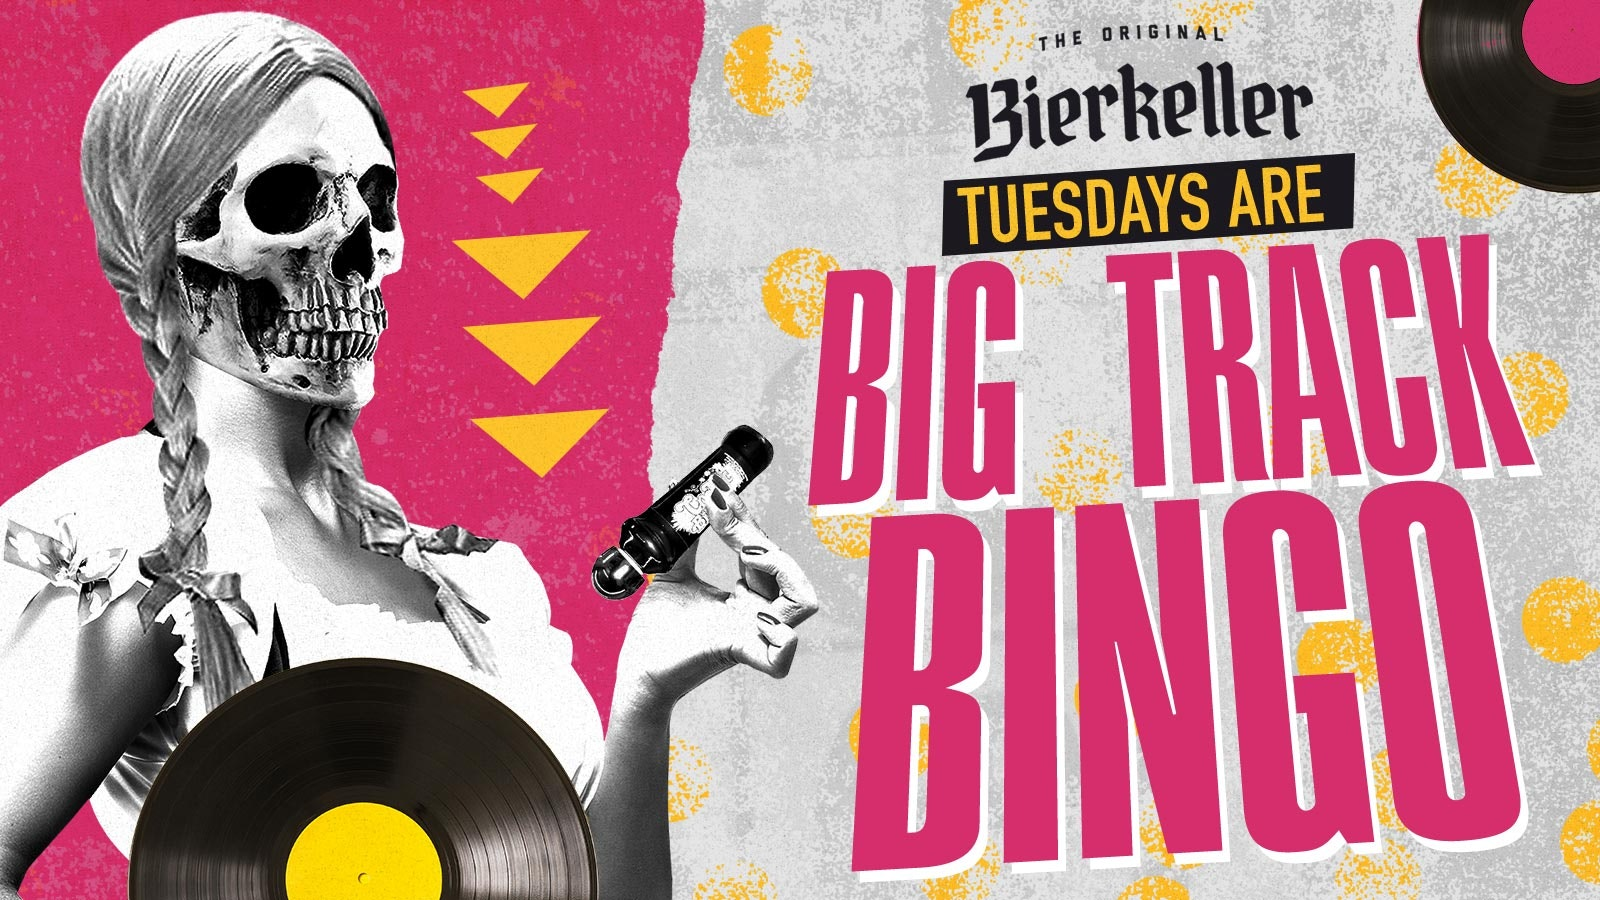 Big Track Bingo – Tuesday